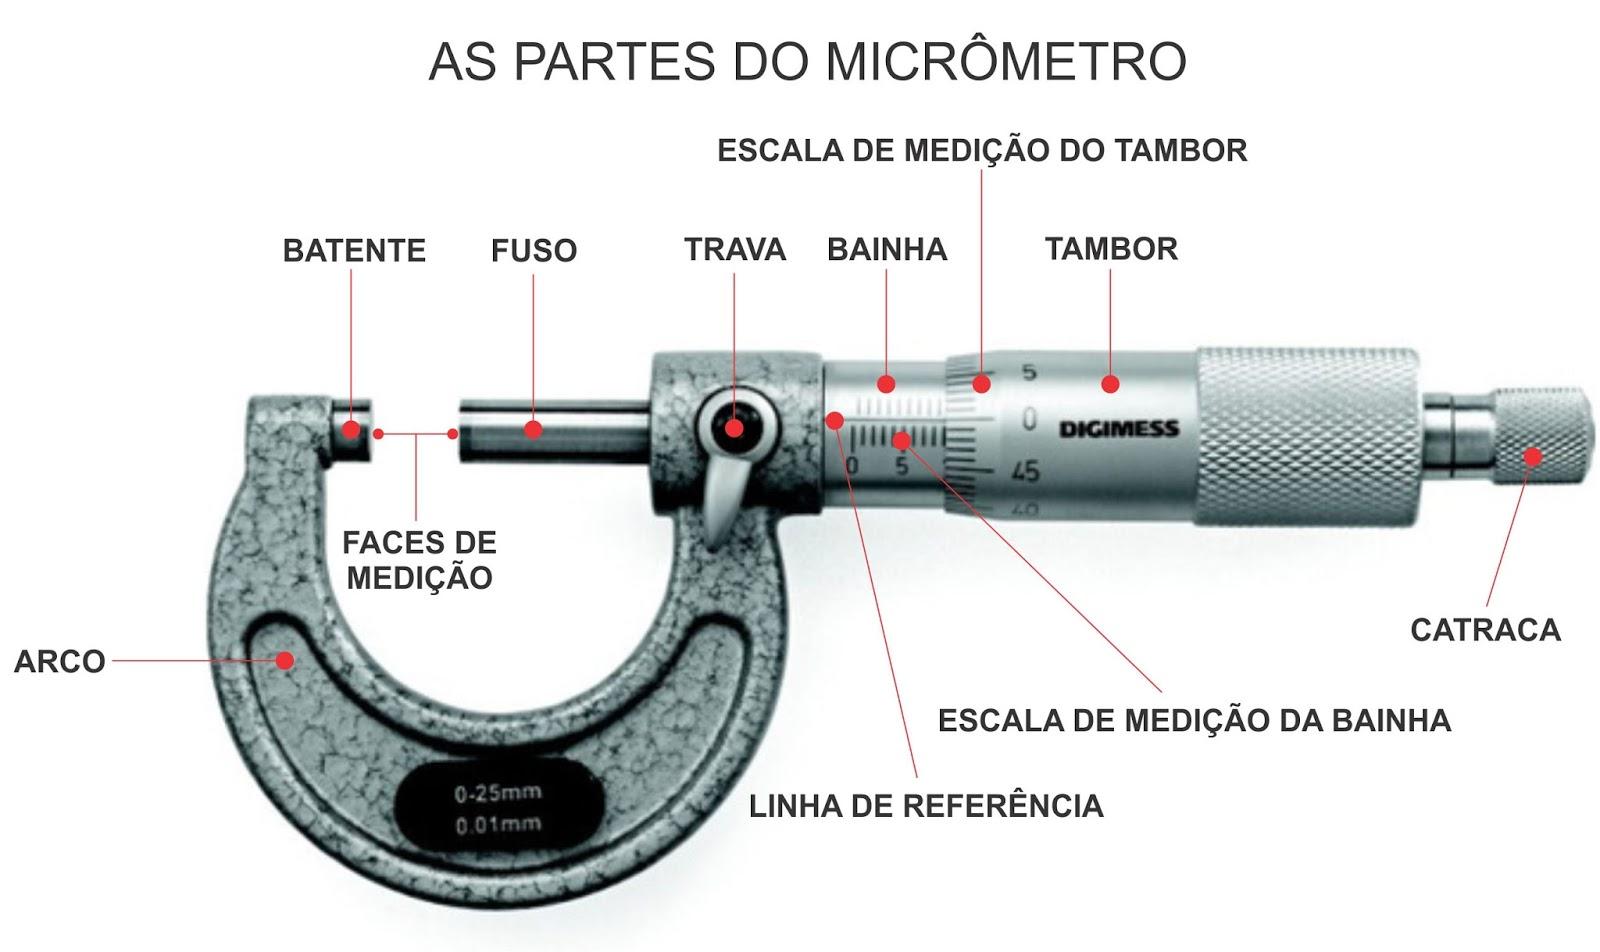 As partes de um micrômetro